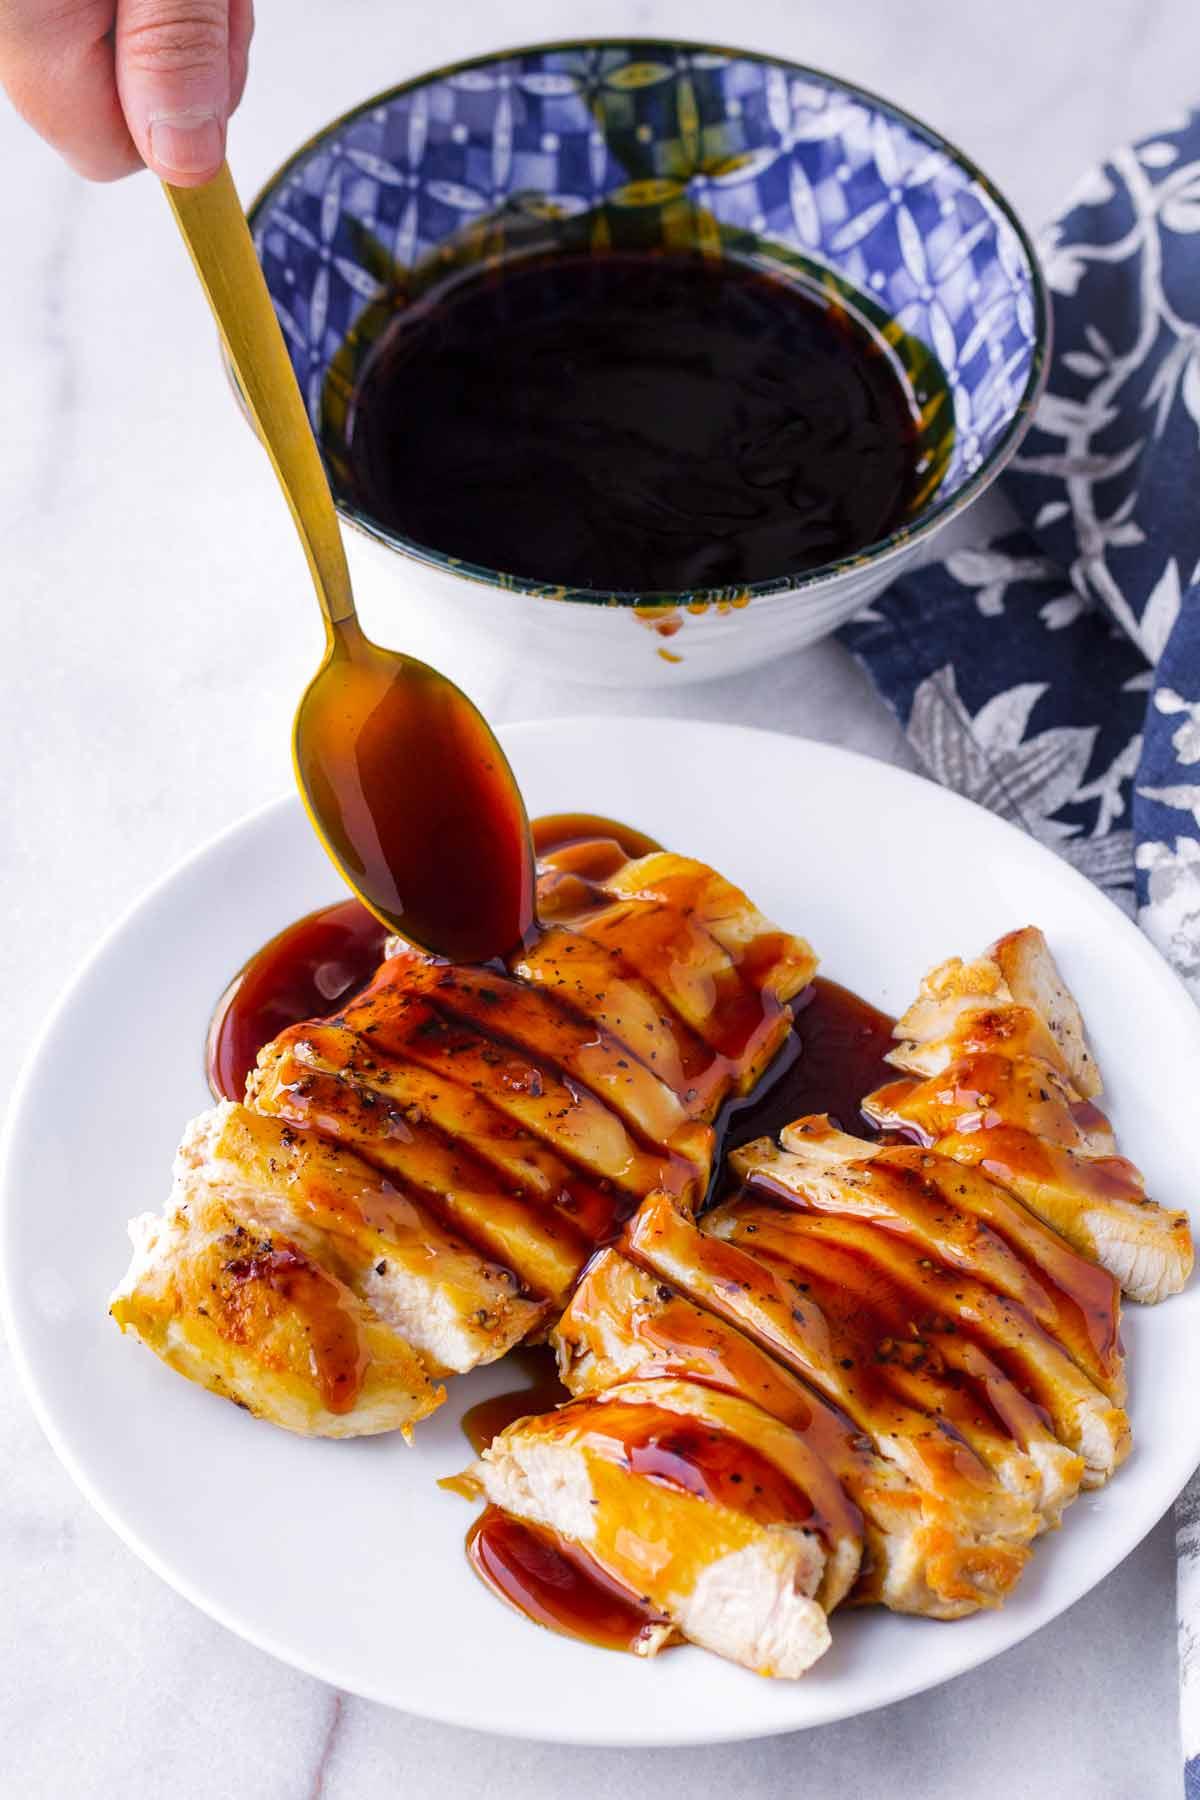 teriyaki sauce being spooned over sliced chicken on plate